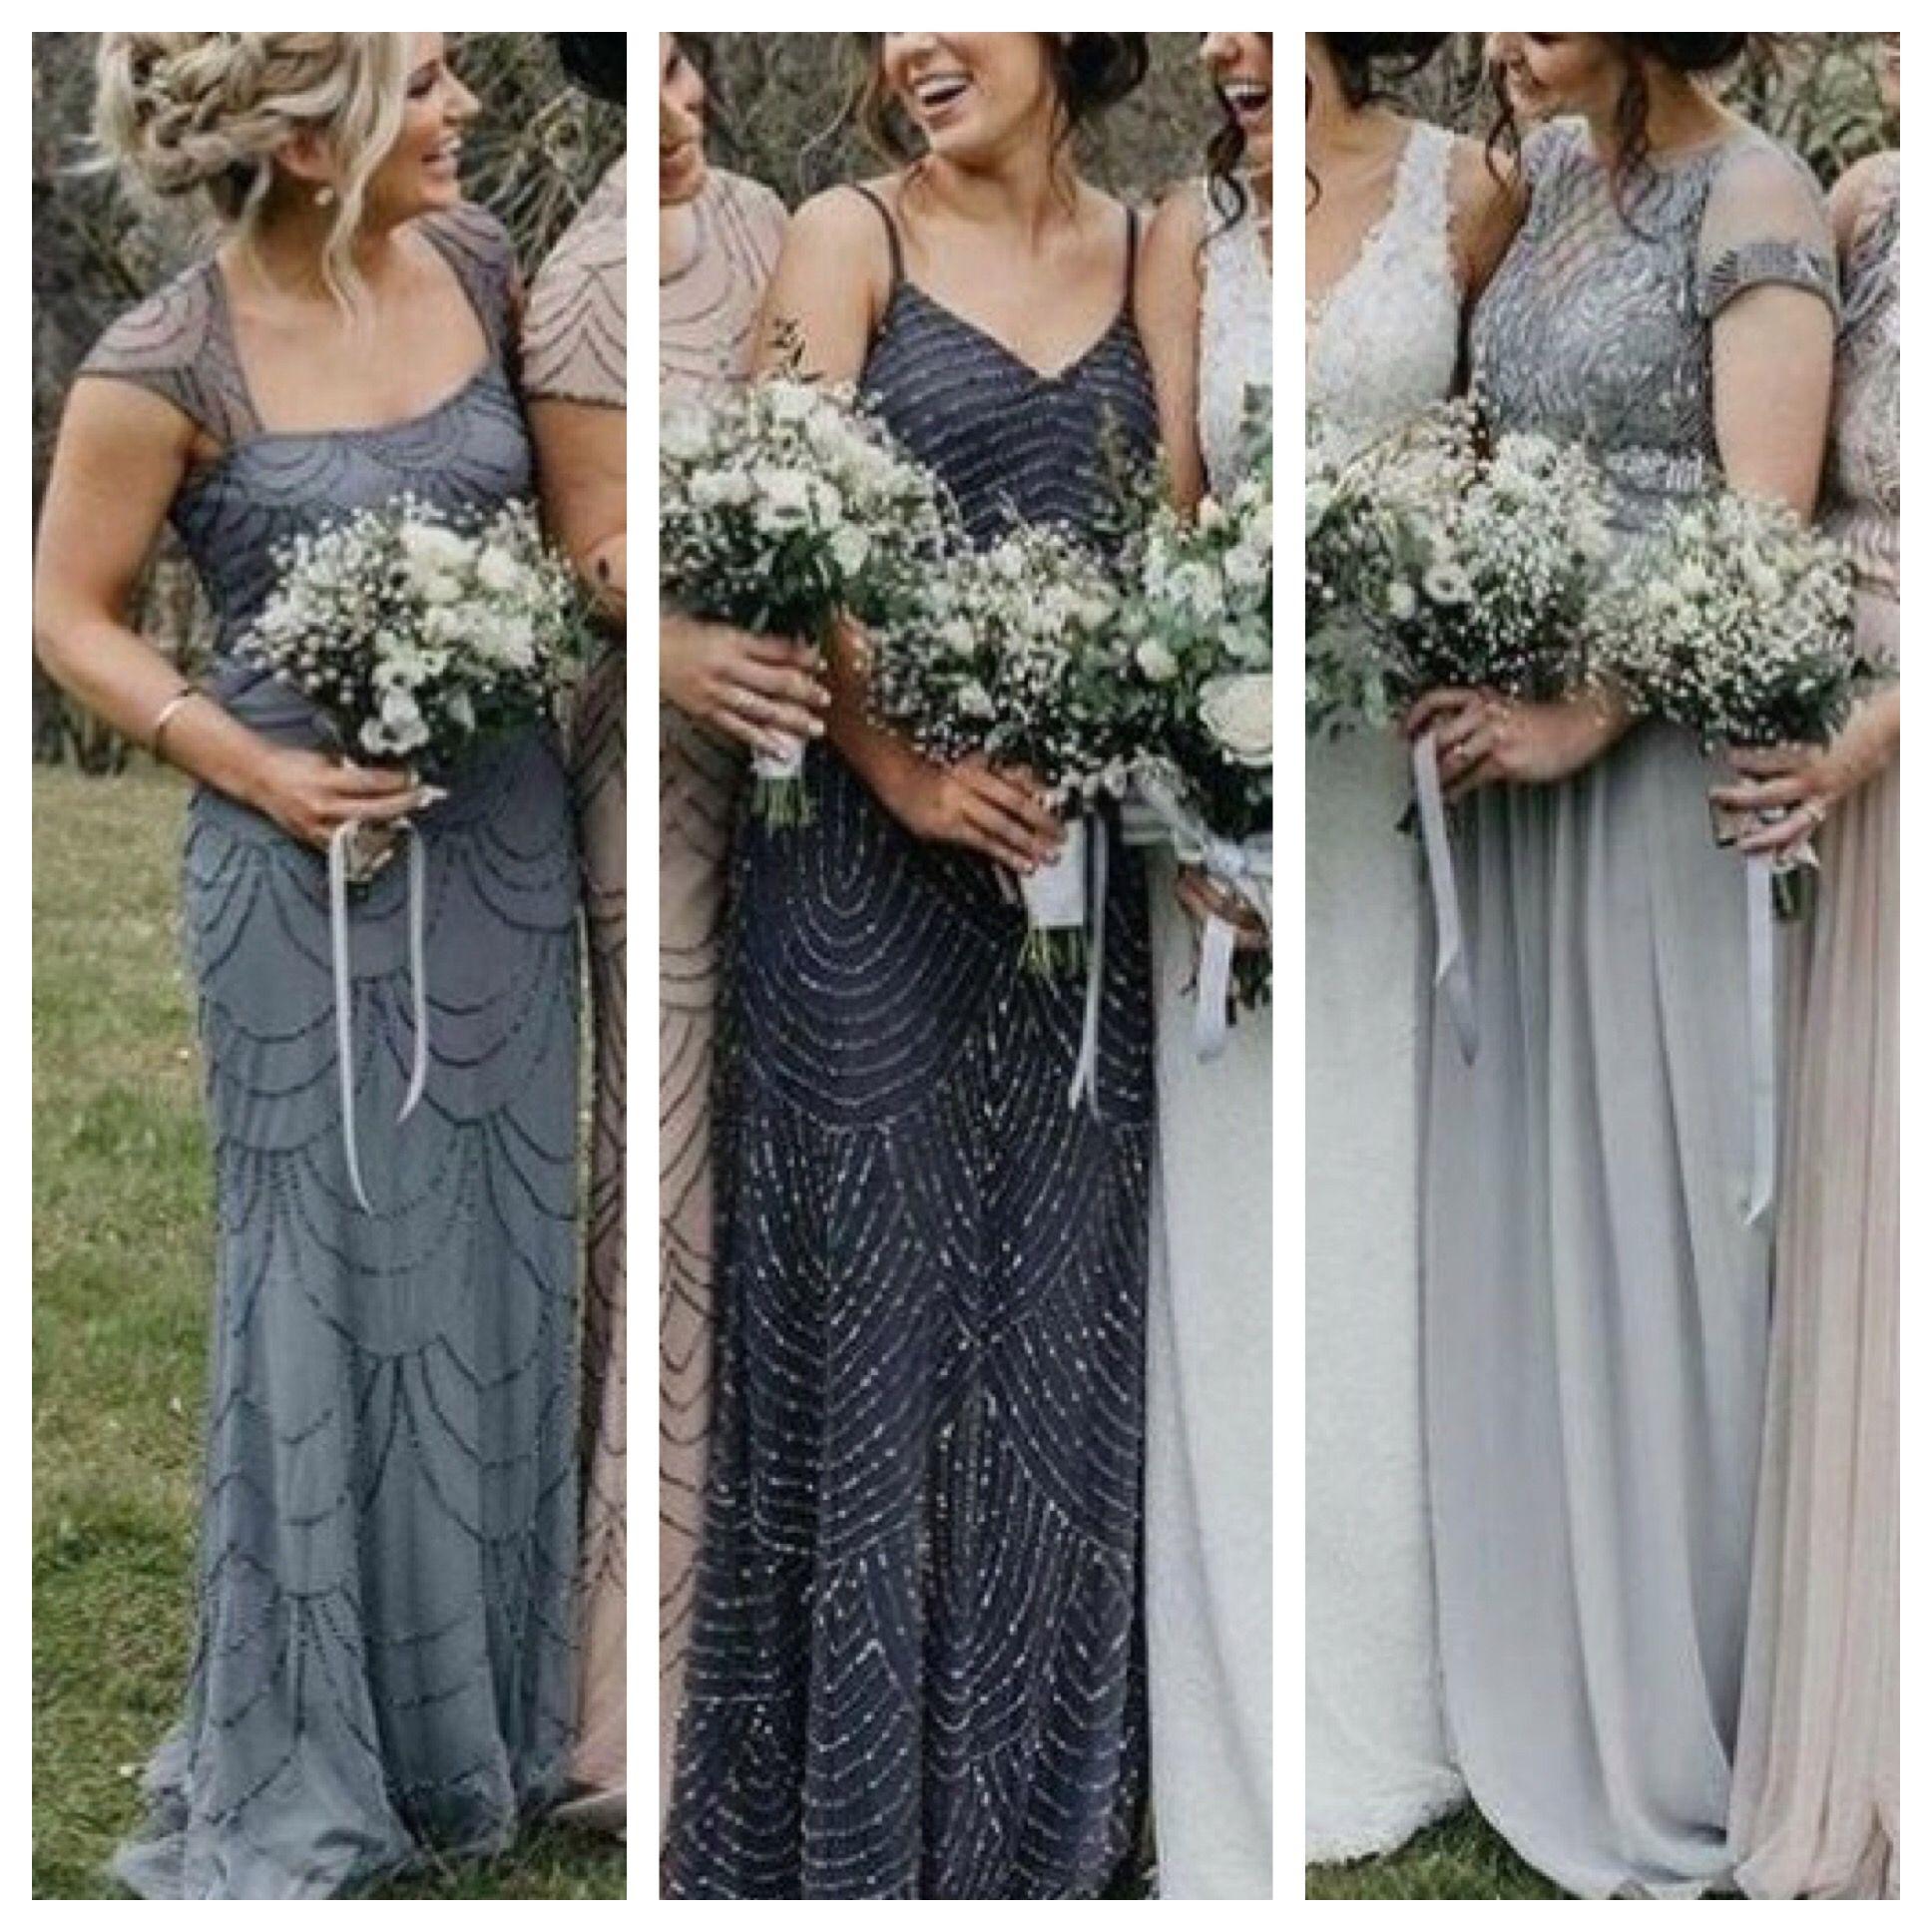 Silver Grey Navy Sparkle Bridesmaid Dresses Winter Wedding Mismatched Winter Bridesmaid Dresses Mismatched Grey Bridesmaid Dresses Grey Bridesmaid Dresses